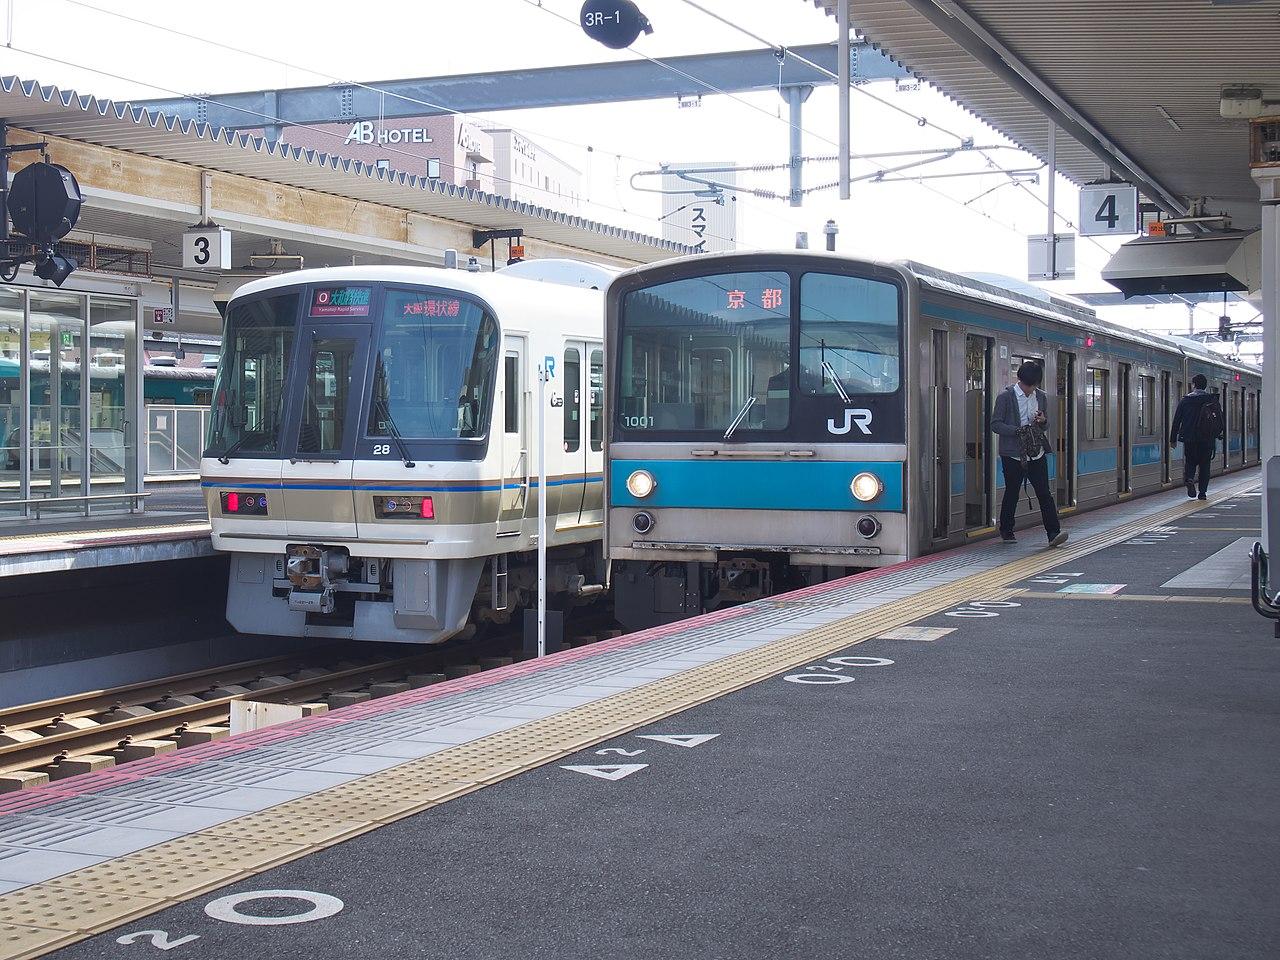 221 series Yamatoji rapid at Nara station